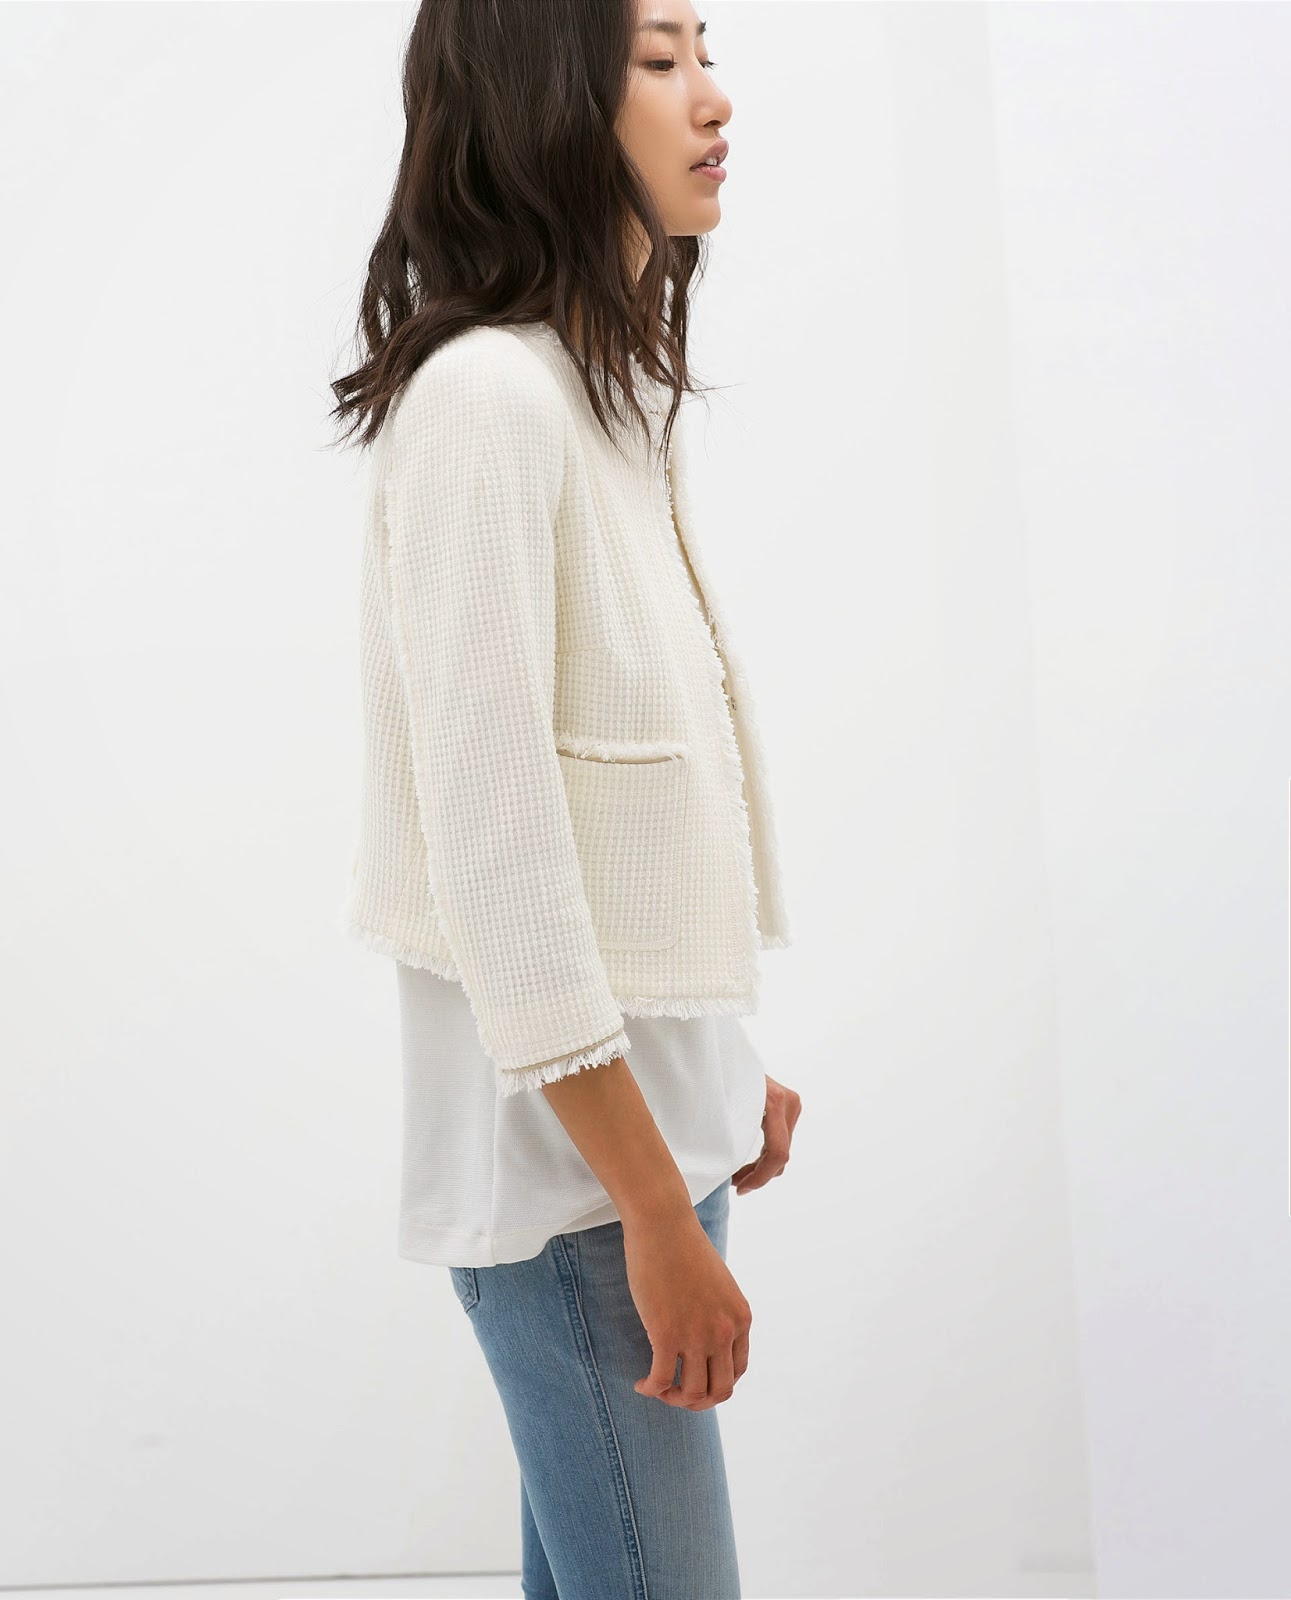 Chaqueta chanel Zara, Blanco y jeans, street style, look, fashion style